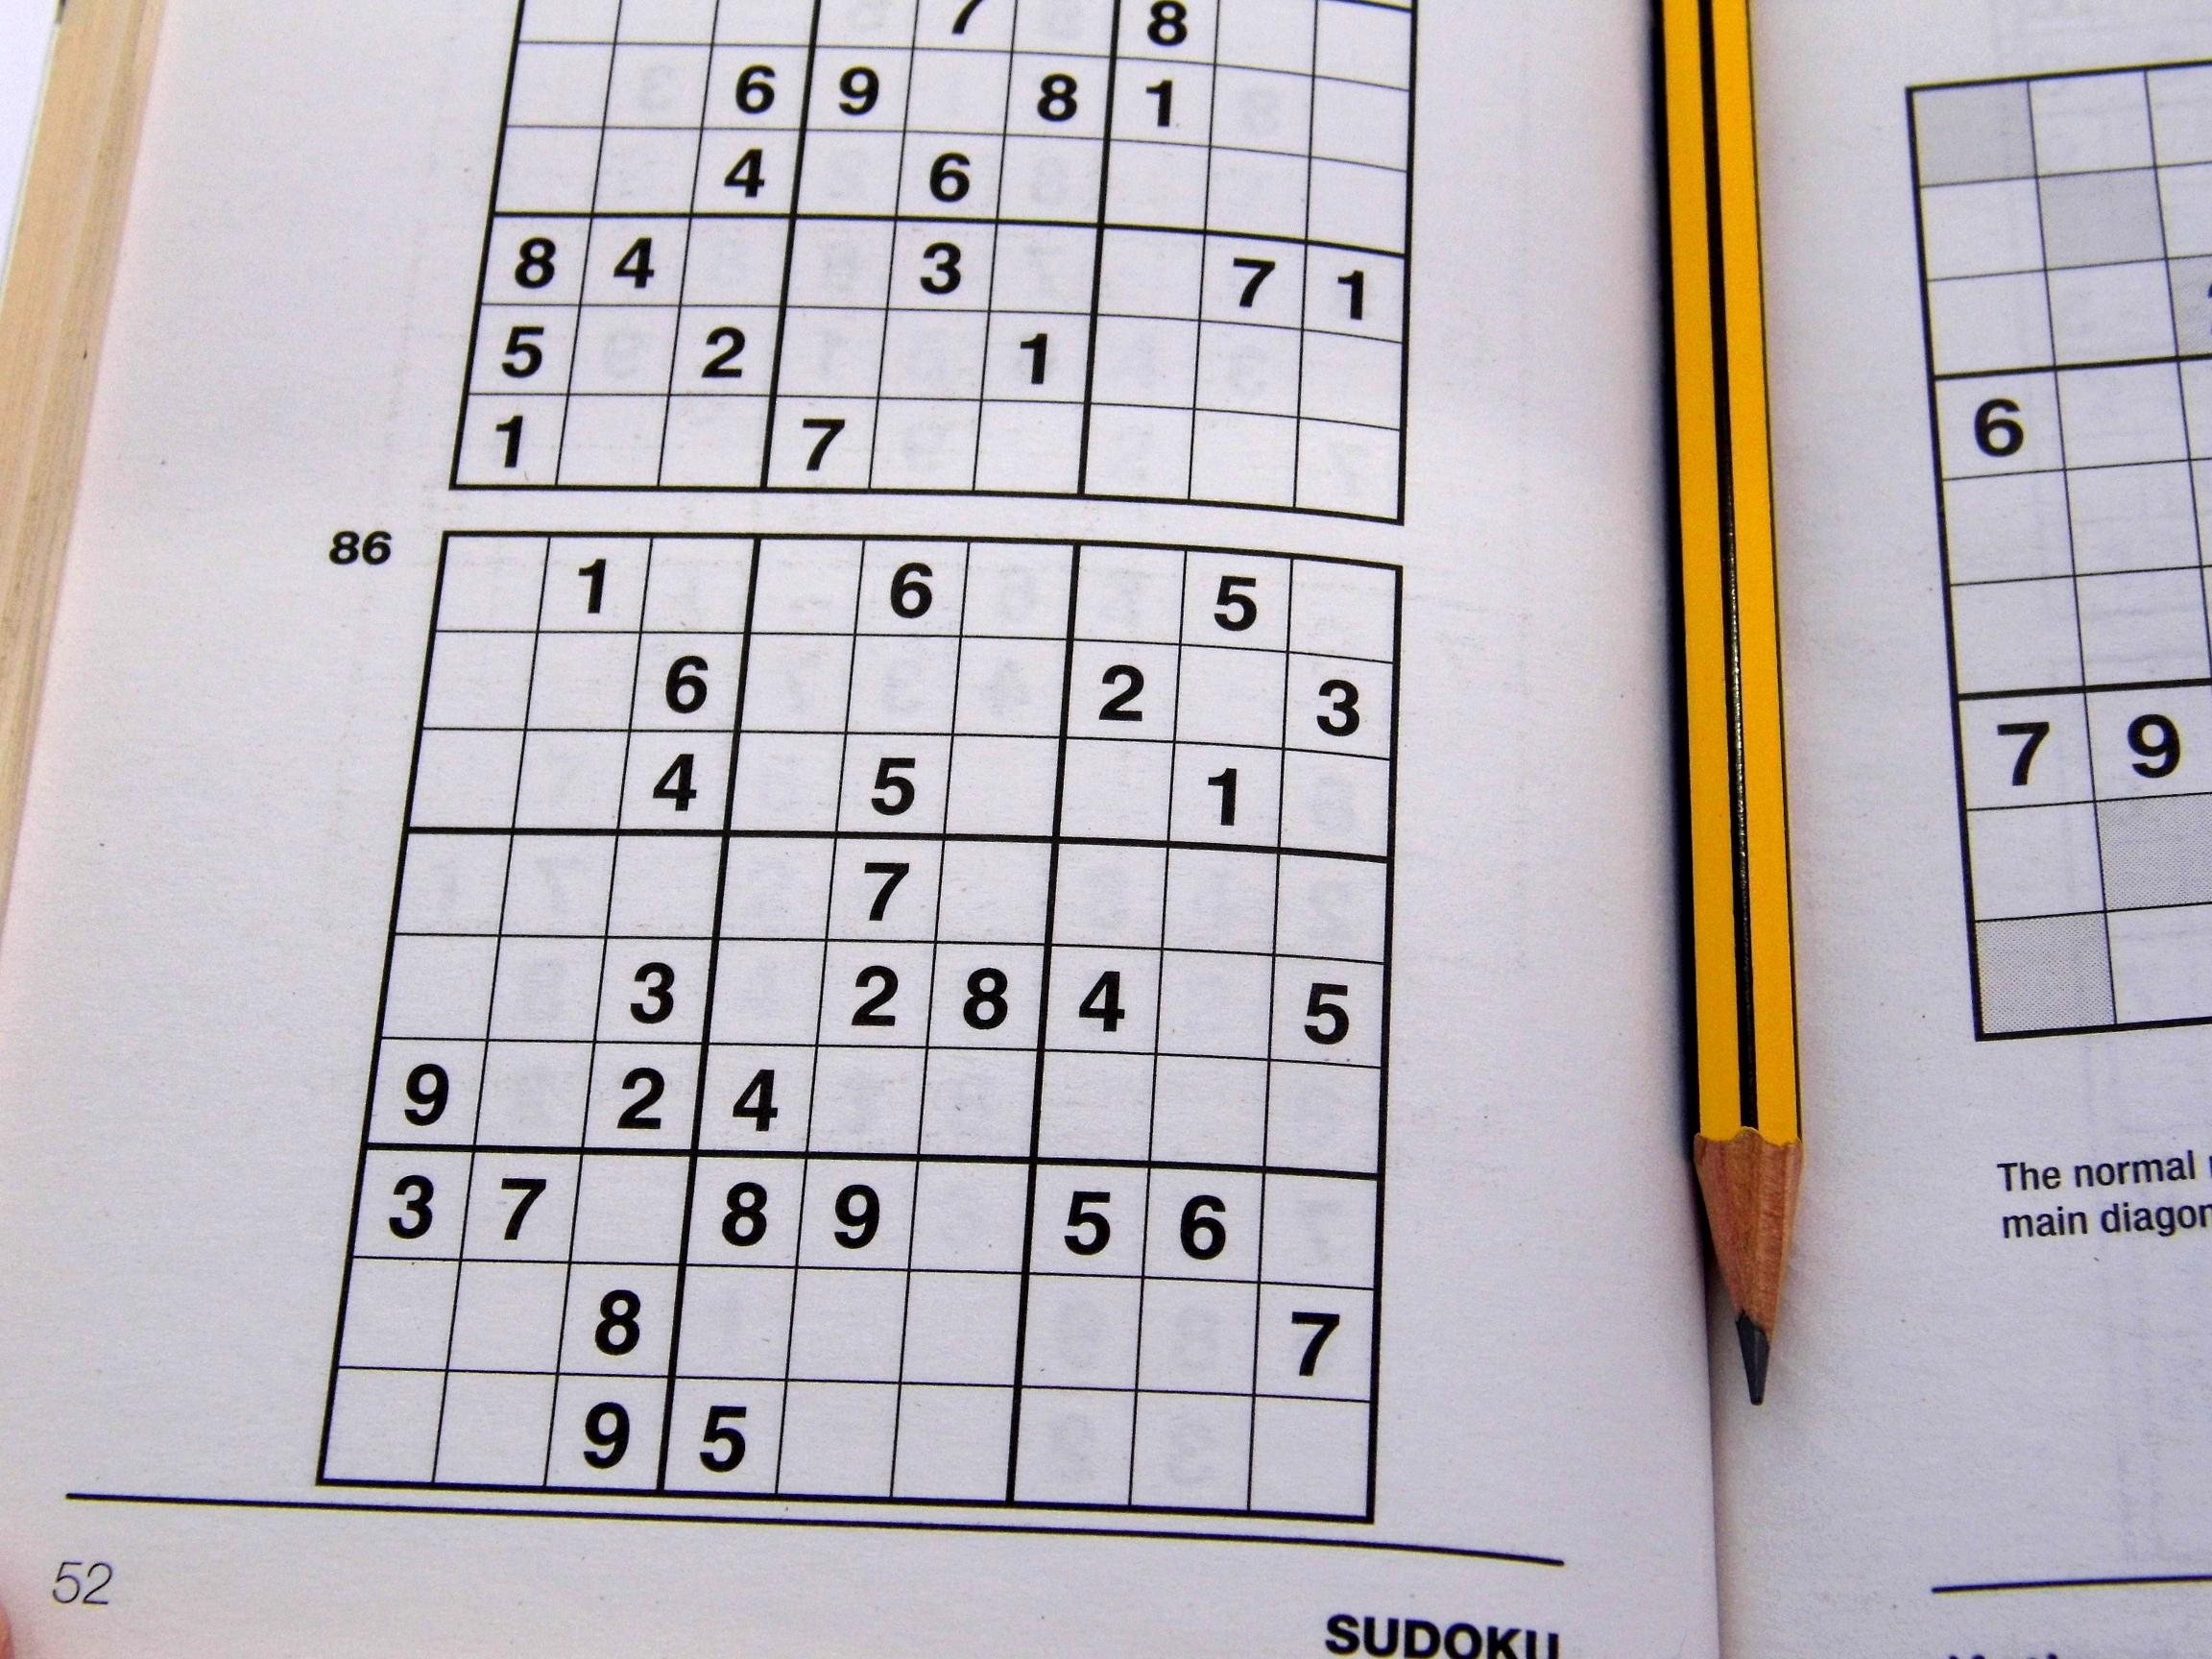 Medium Printable Sudoku Puzzles 6 Per Page – Book 1 – Free Sudoku - Printable Sudoku Puzzles 1 Per Page